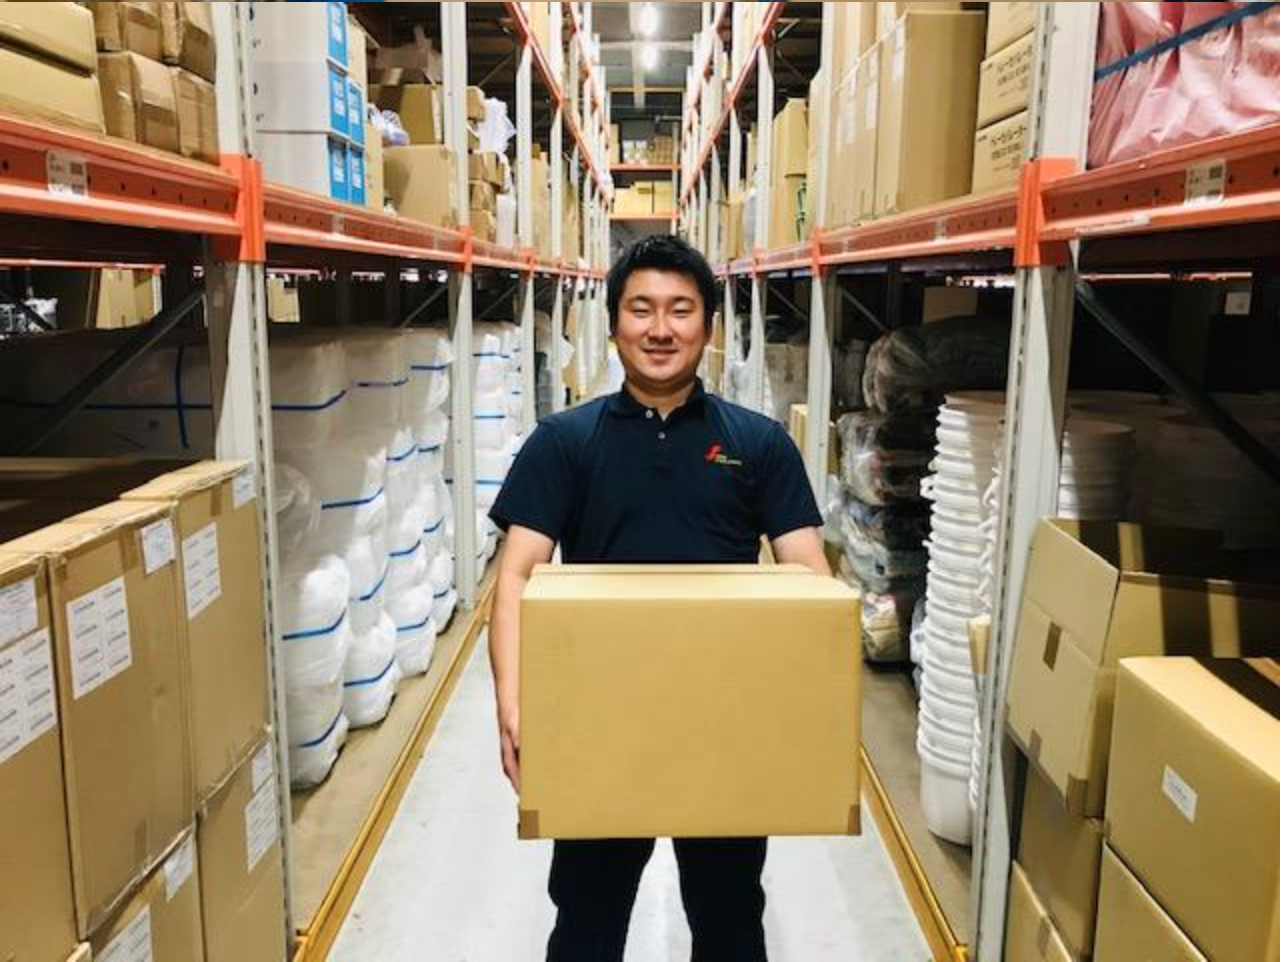 【Kasugai, Aichi】Sorting Work in a Logistics Warehouse